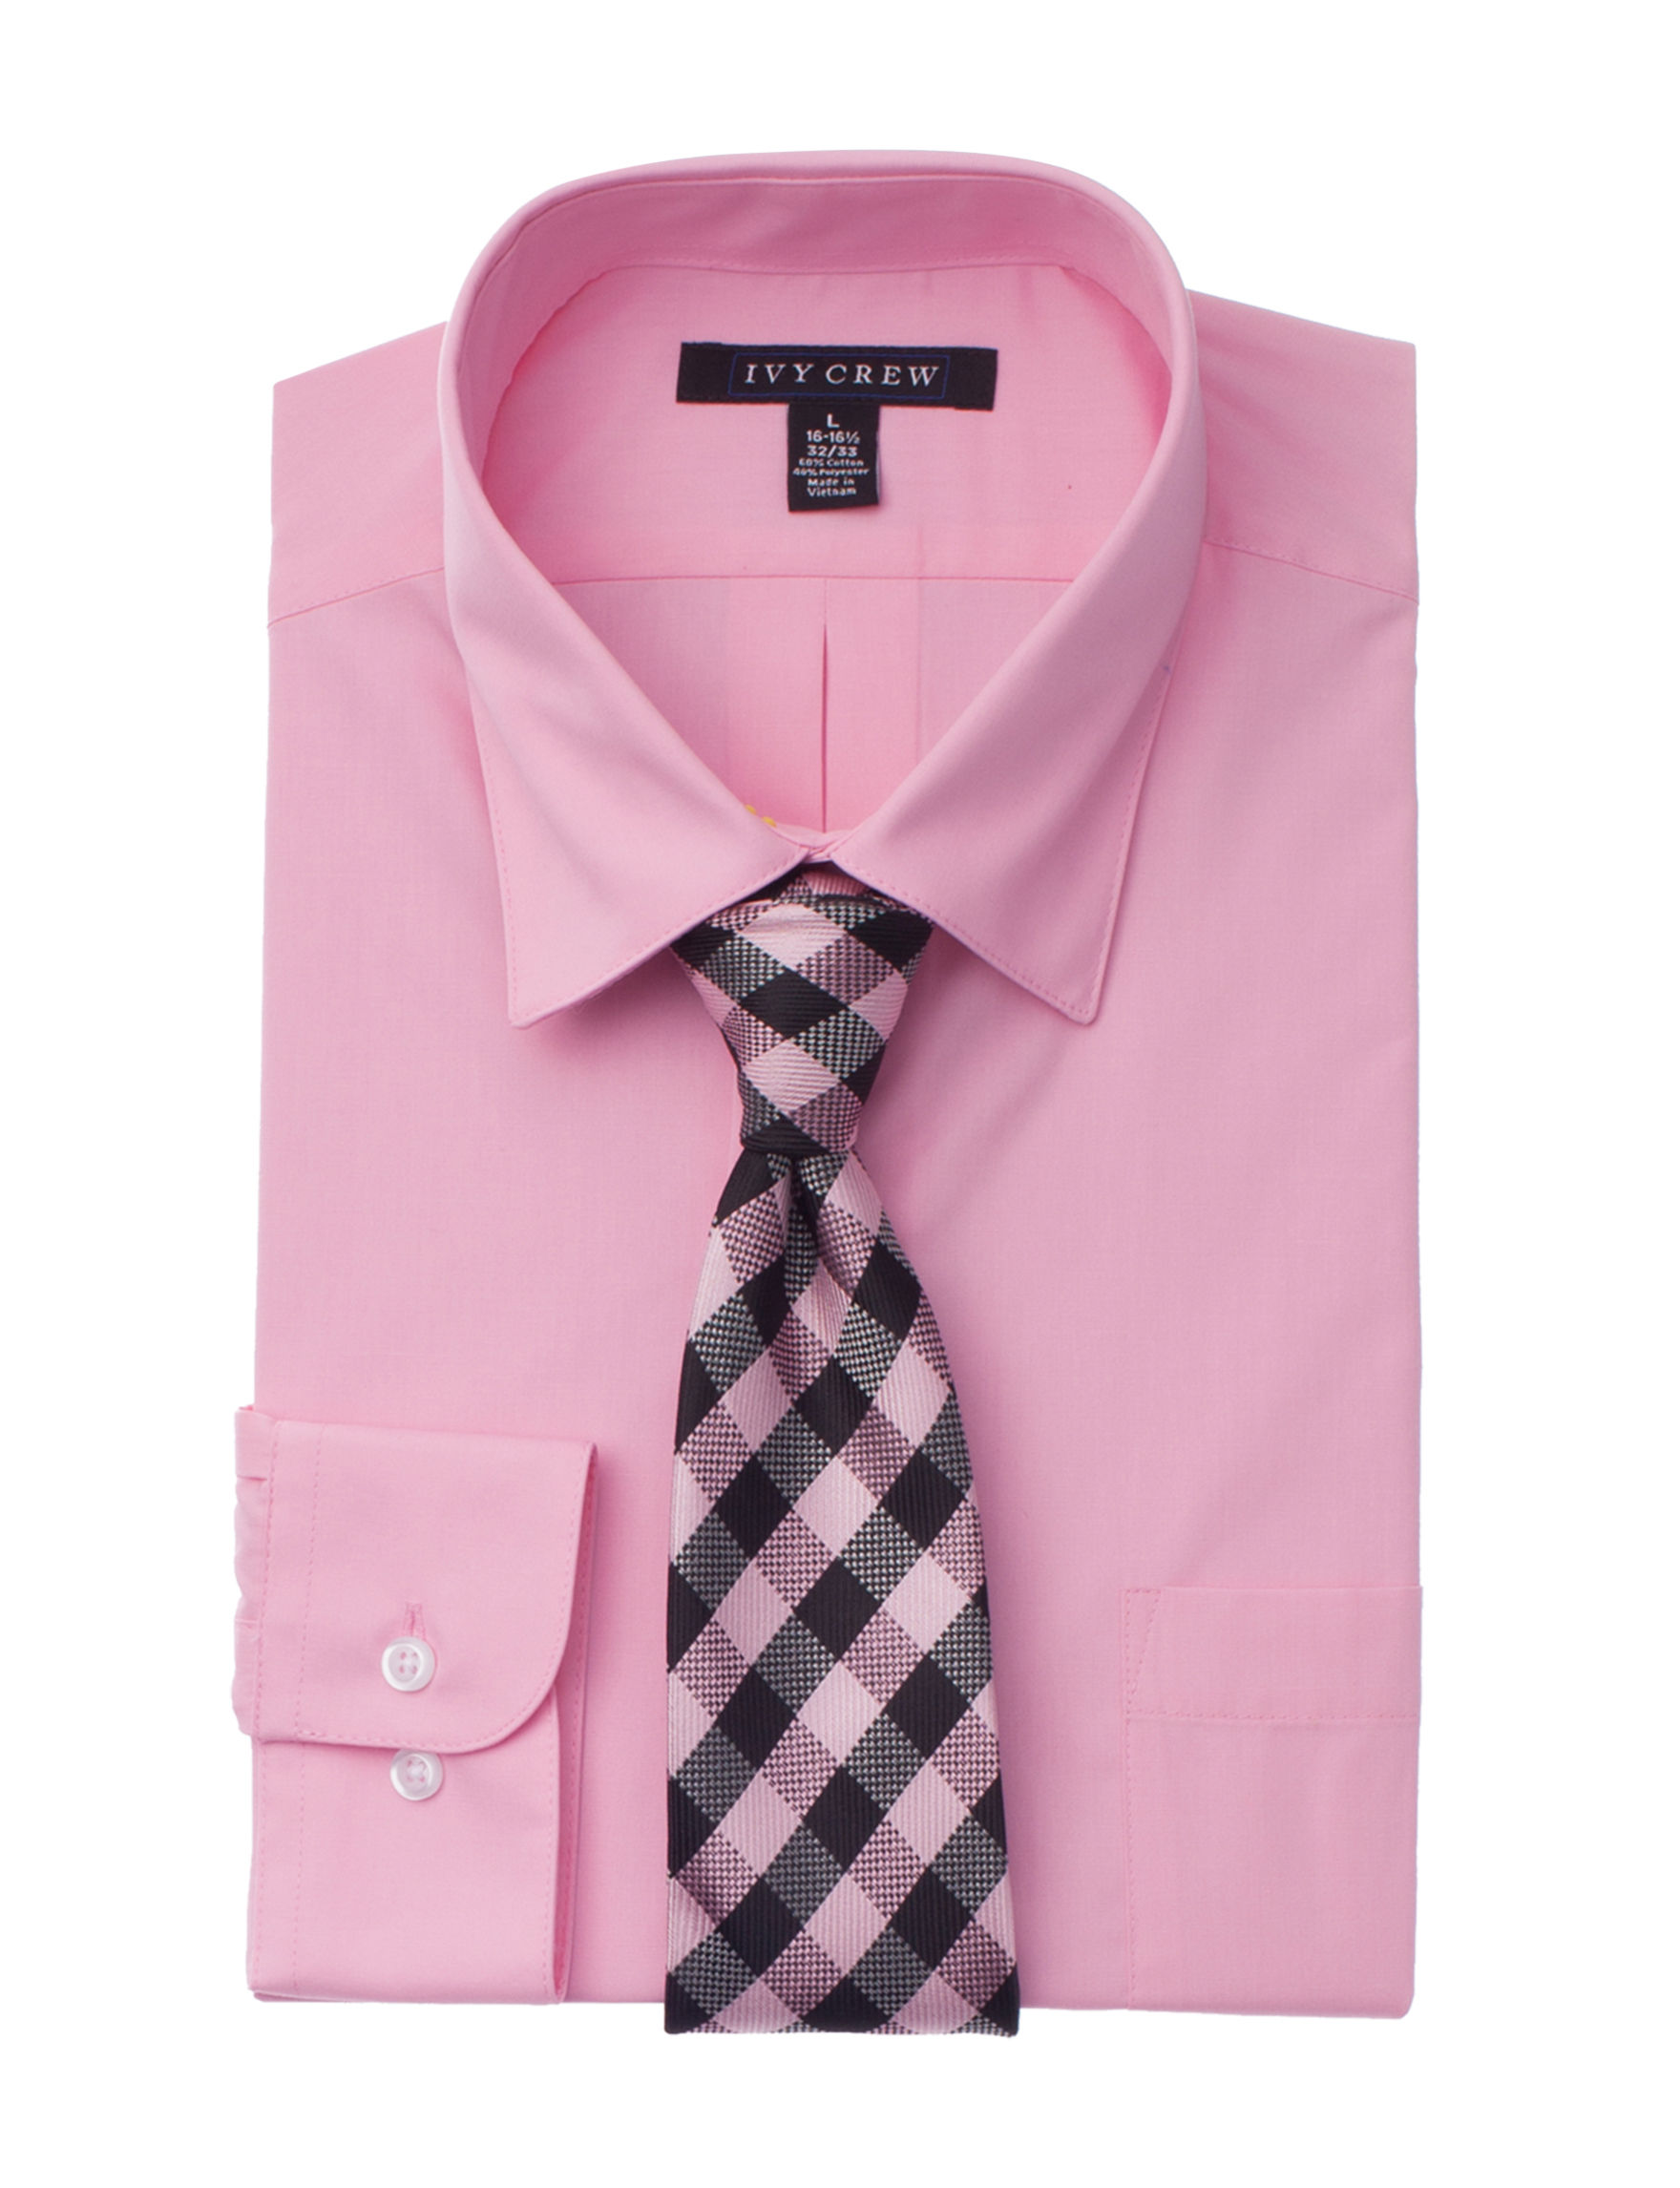 Ivy Crew Pink Dress Shirts